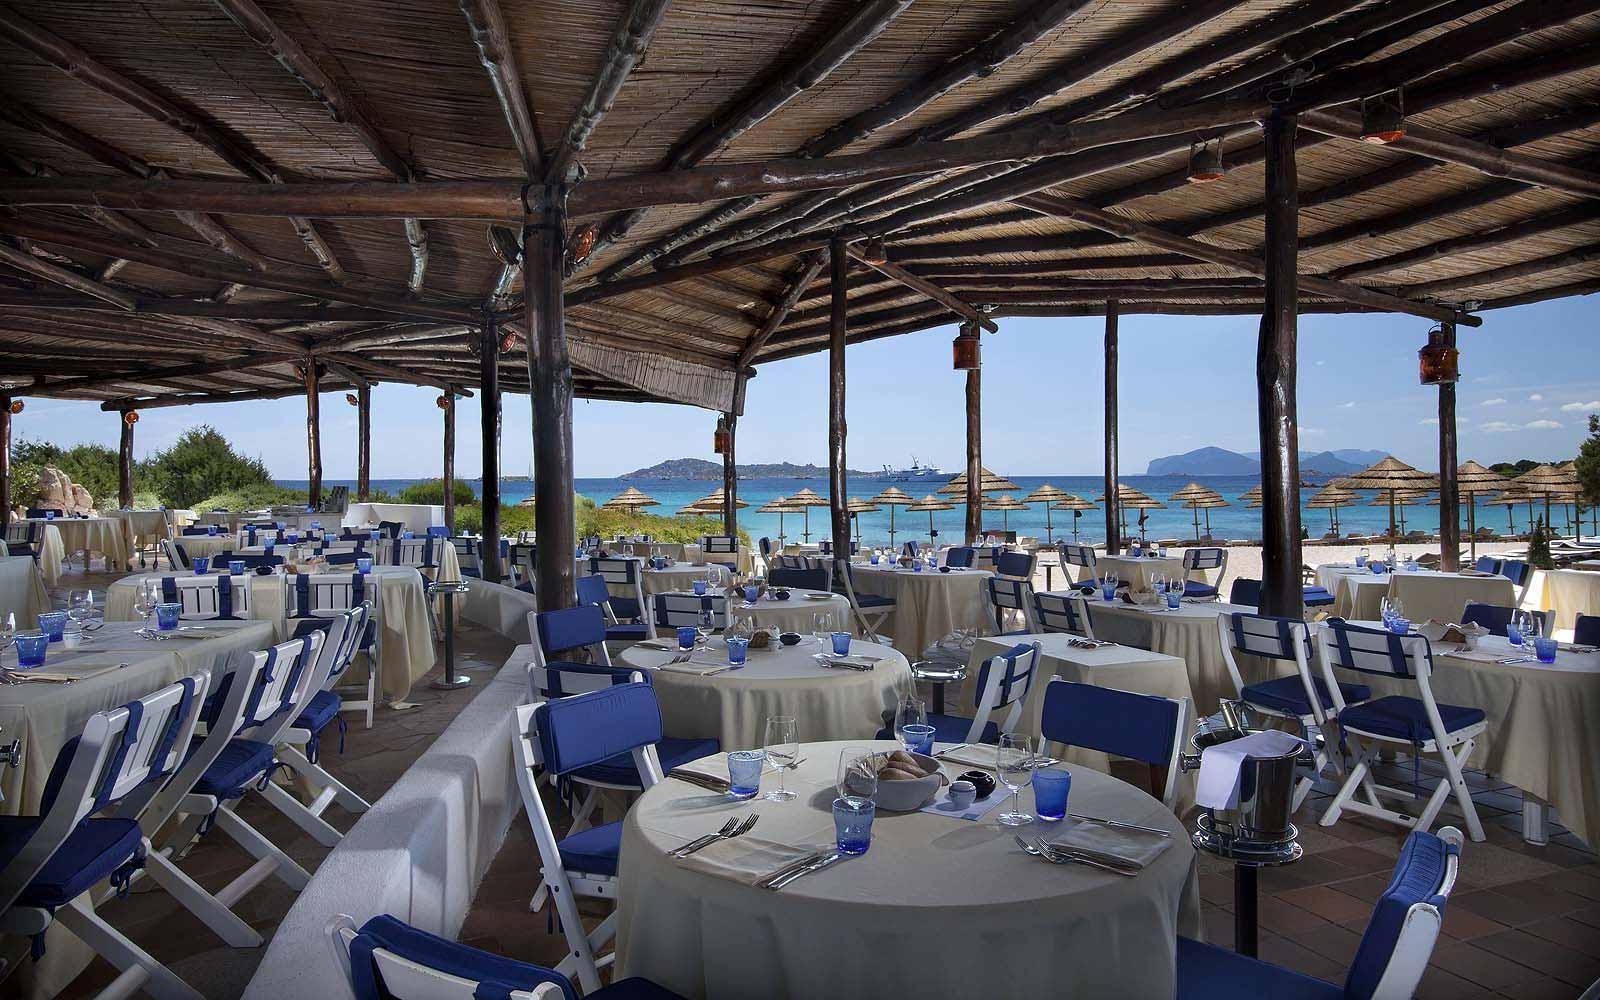 Barbeque restaurant on the beach at Hotel Romazzino